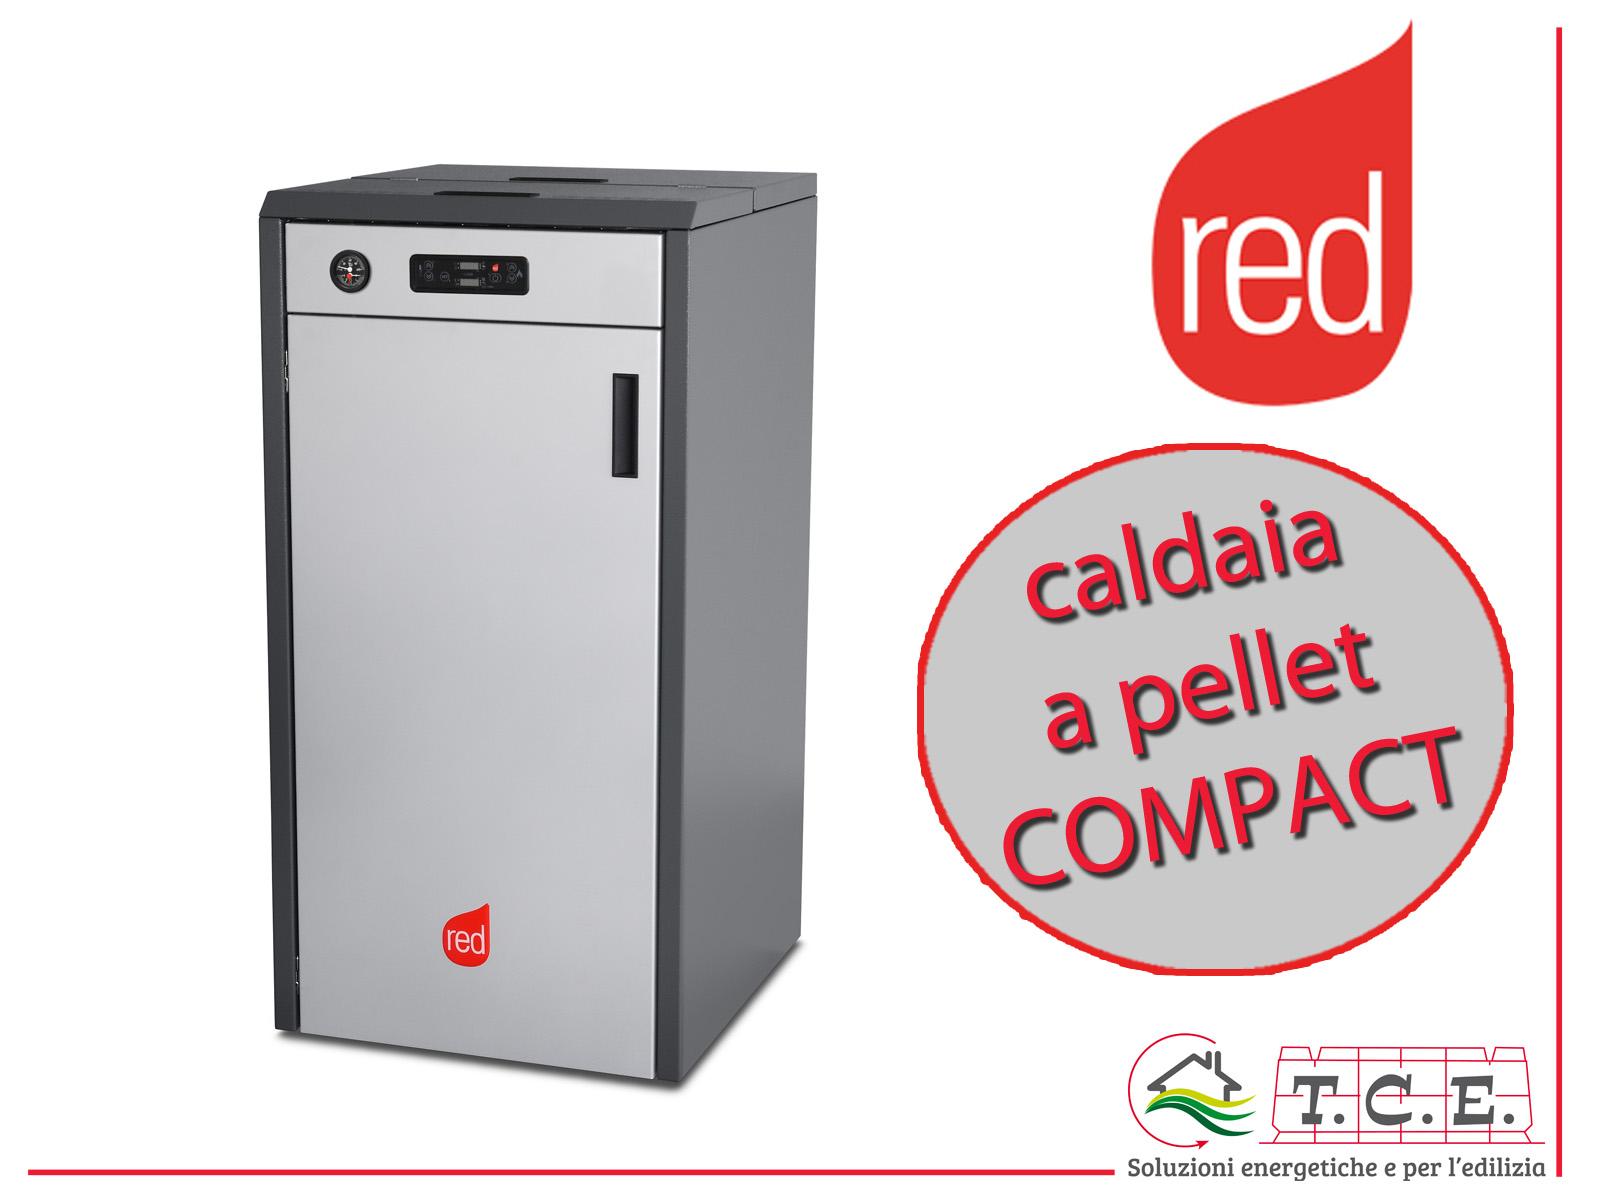 Caldaia a pellet red 365 mod compact 14 18 24 35 45 for Compact 24 pellet